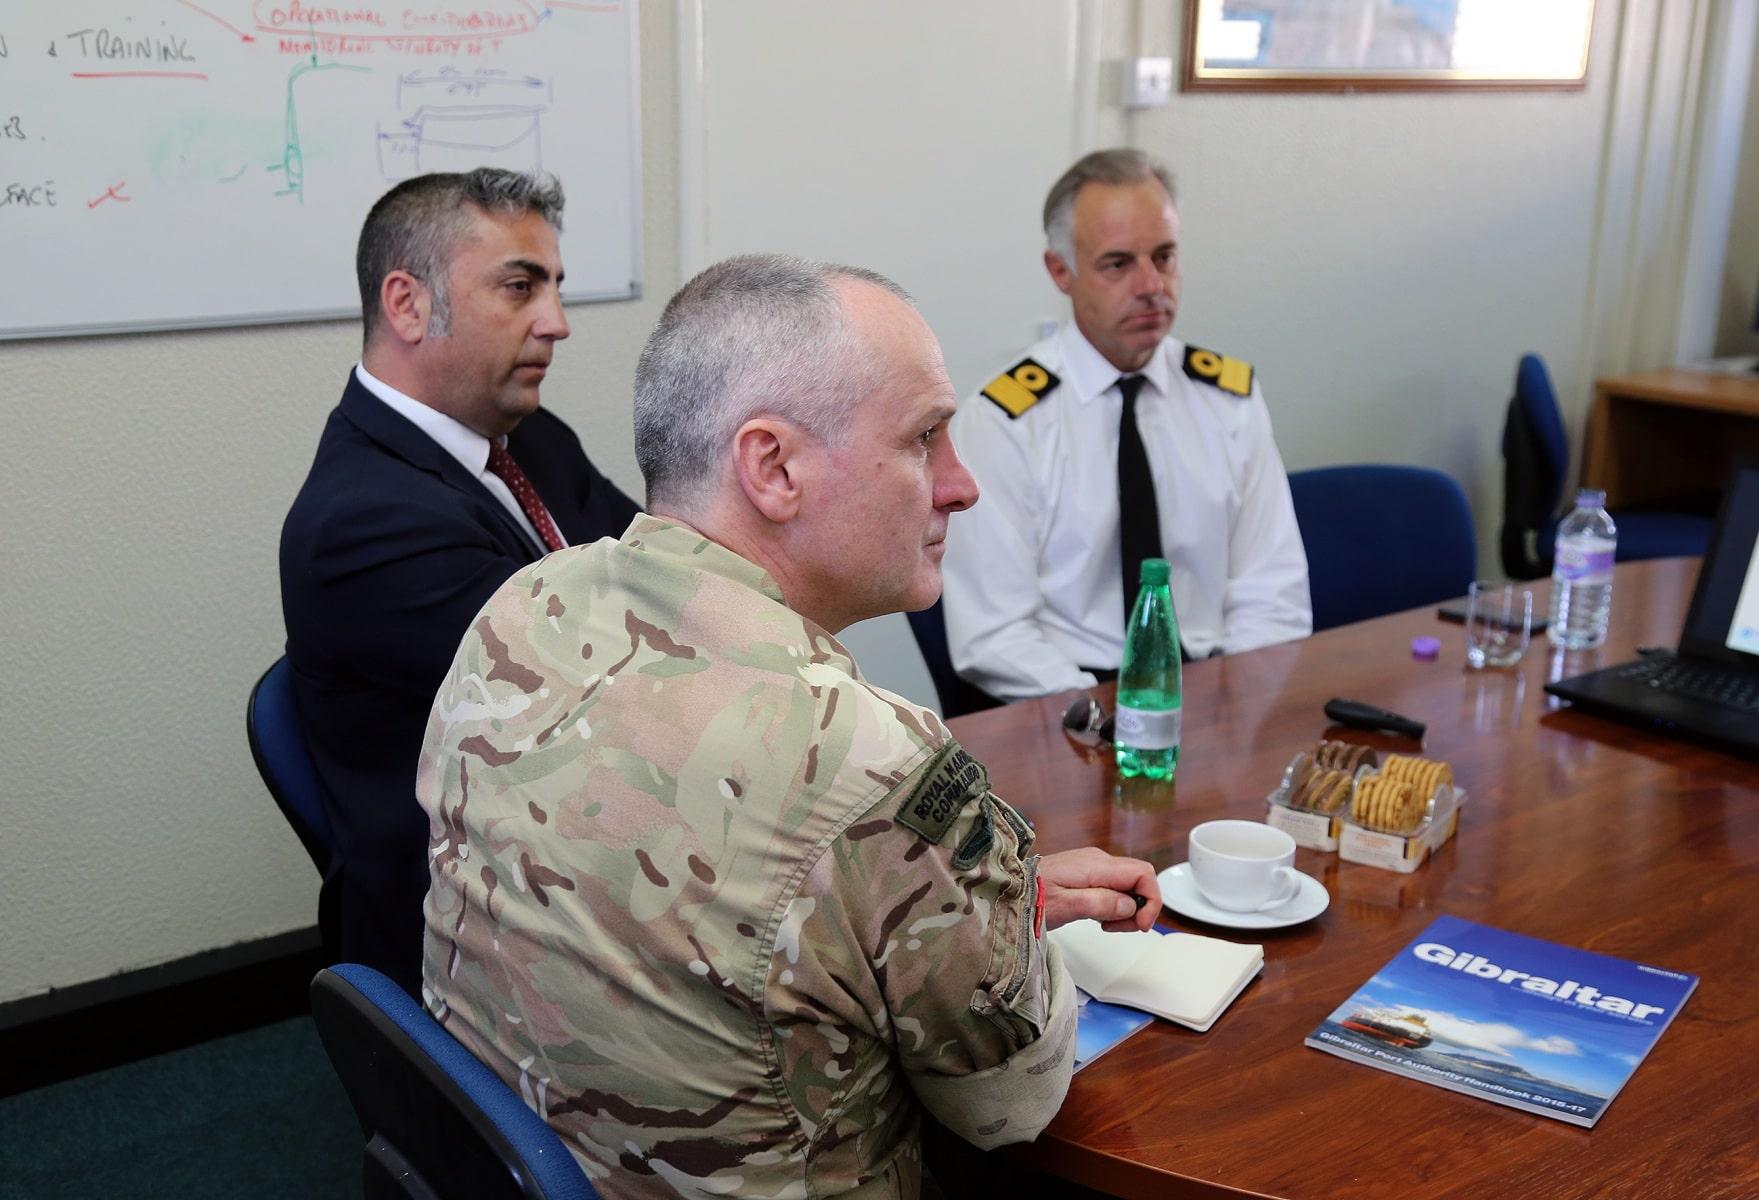 visita-oficial-del-gobernador-al-puerto-de-gibraltar_26062052982_o